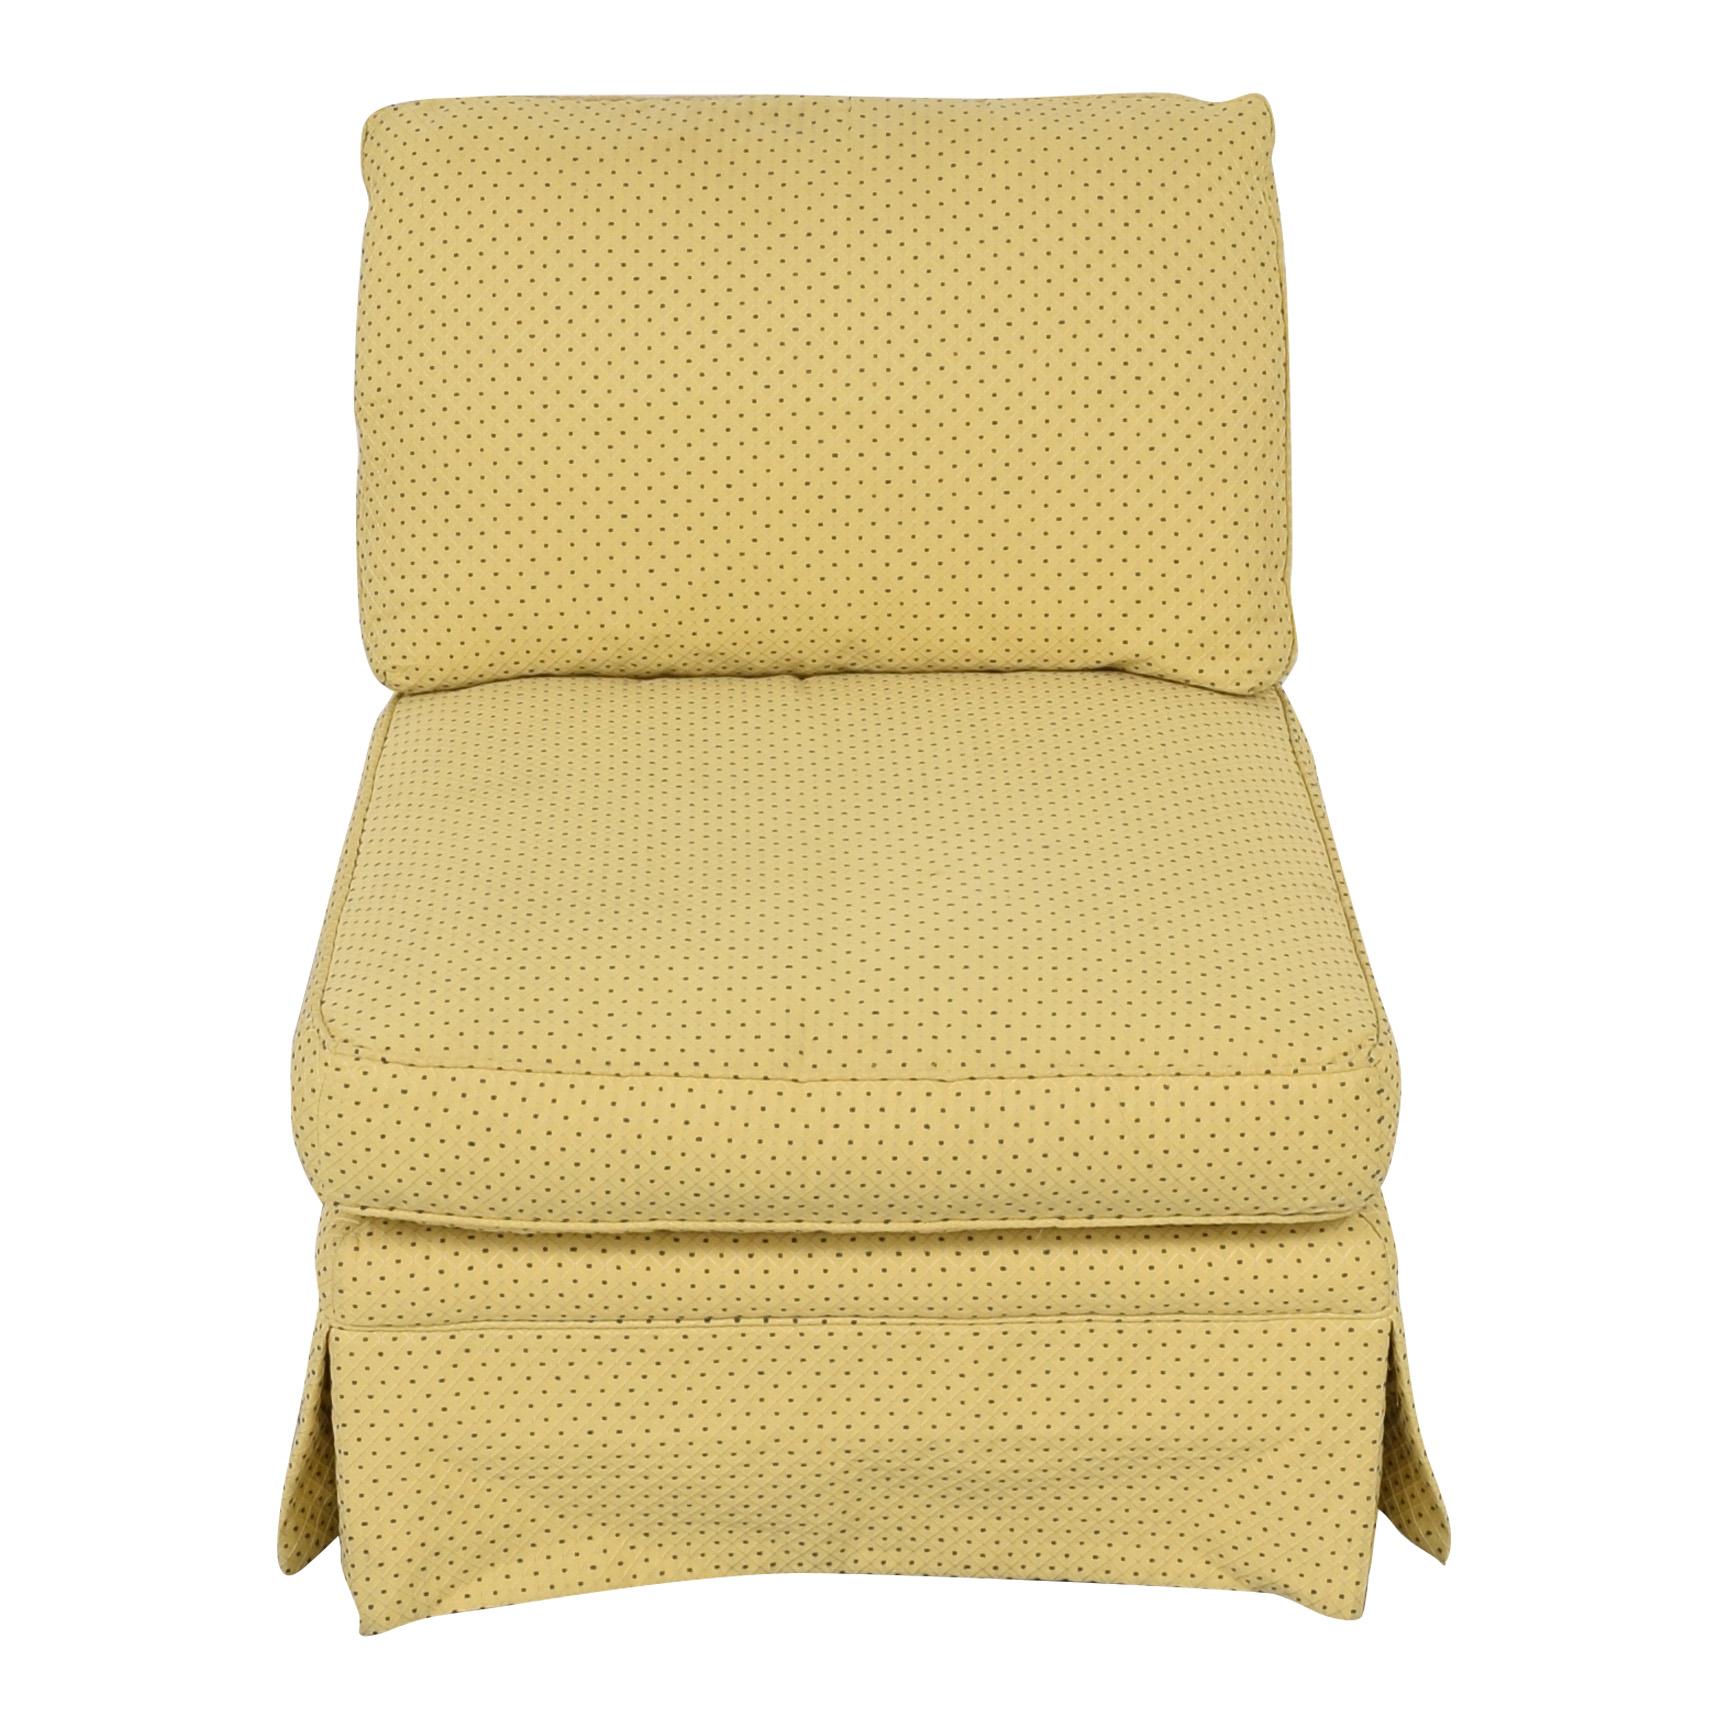 Sherrill Furniture Upholstered Chair Sherrill Furniture